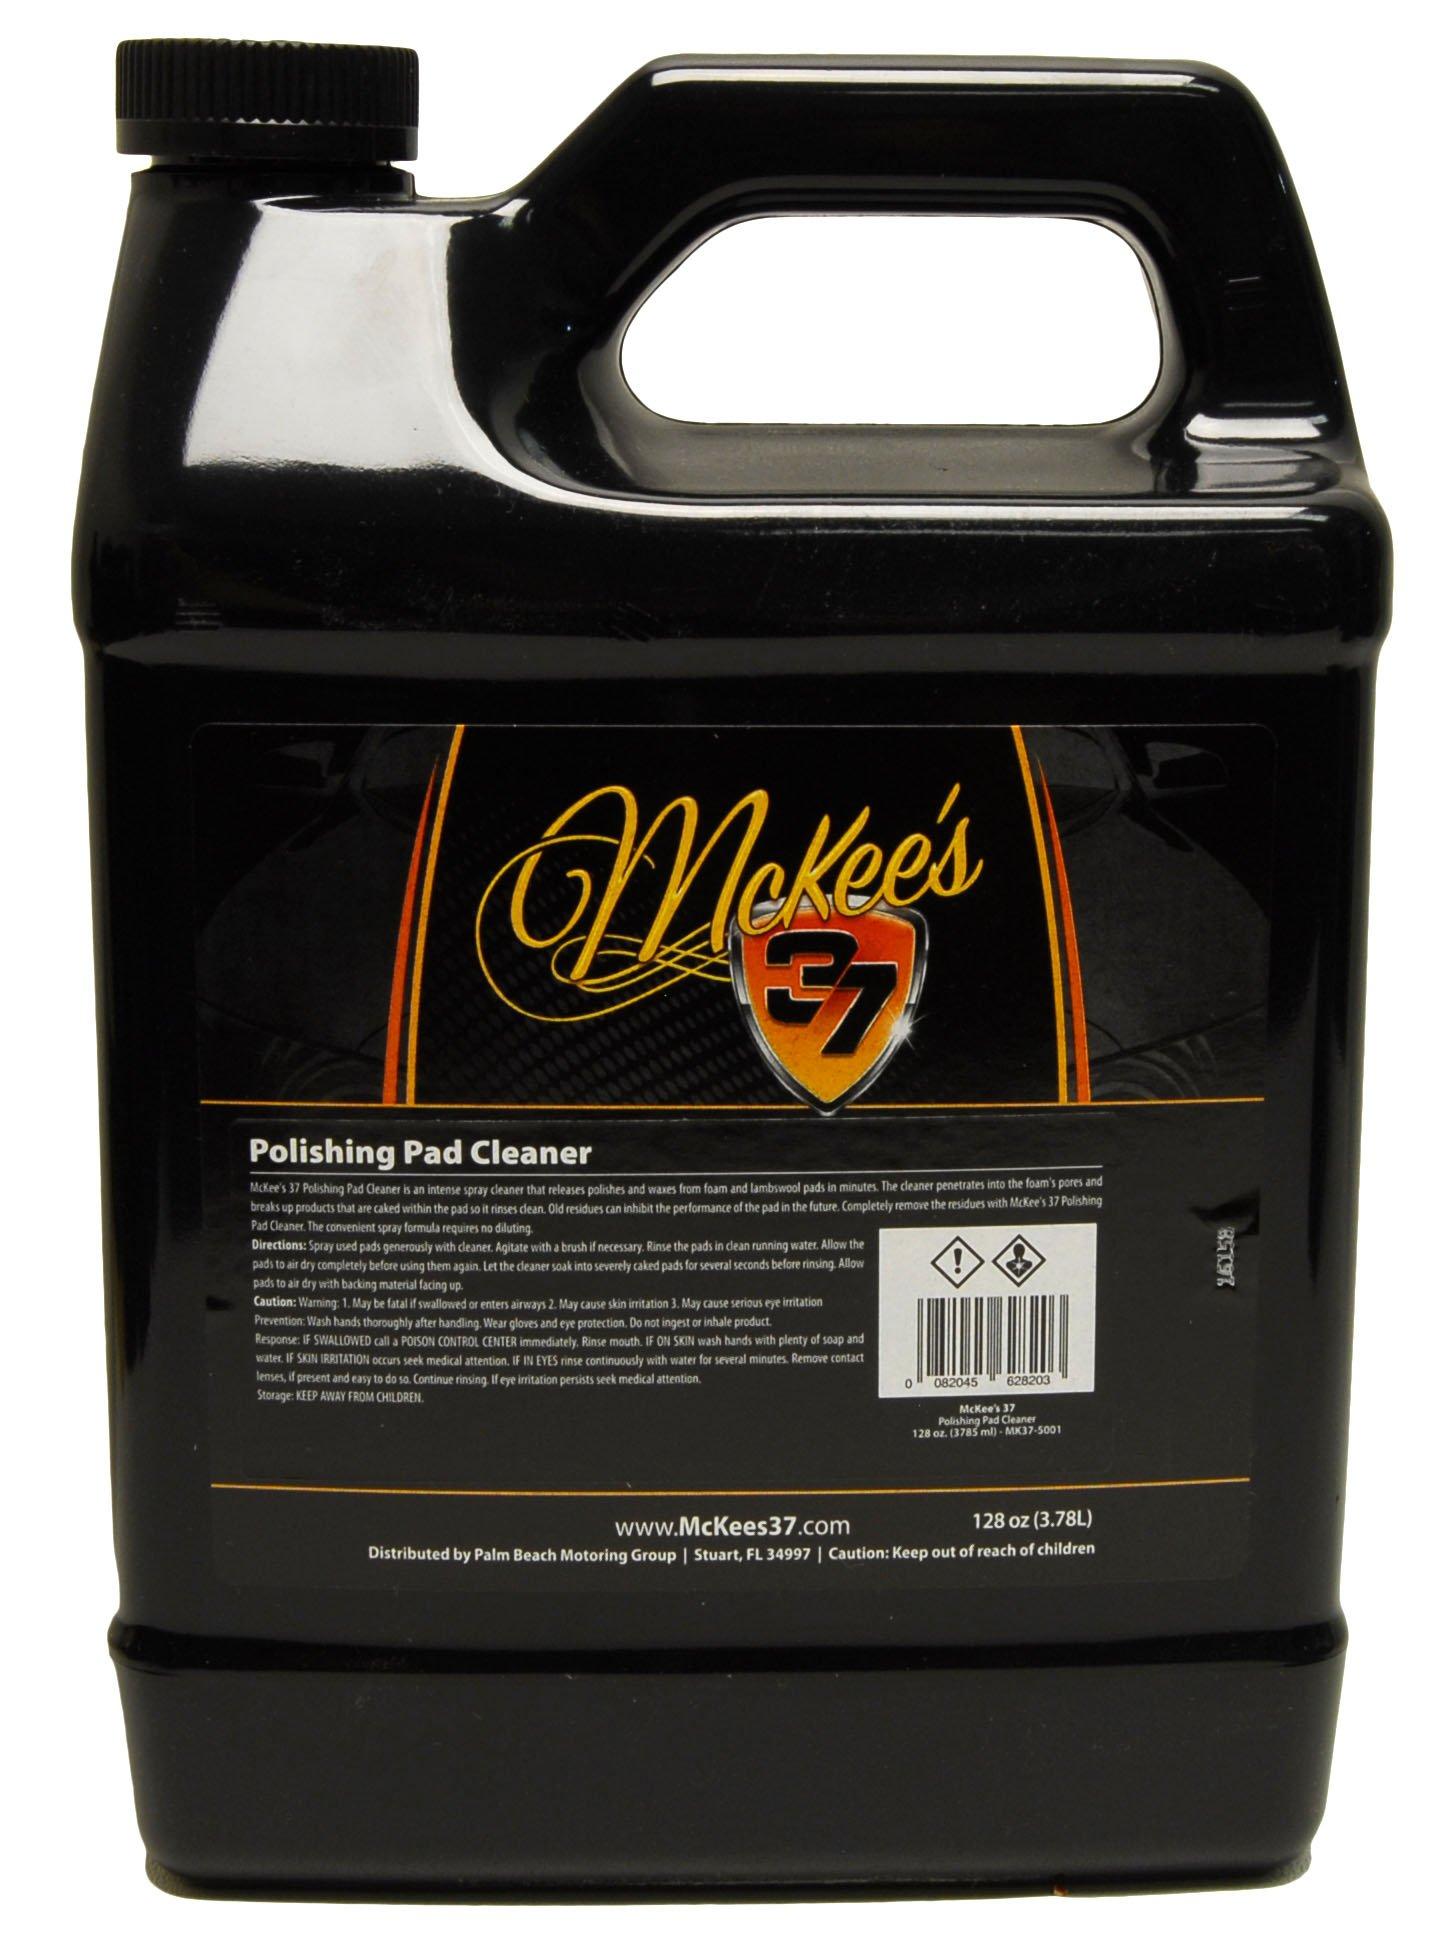 McKee's 37 MK37-5001 Polishing Pad Cleaner 128 Fluid_Ounces